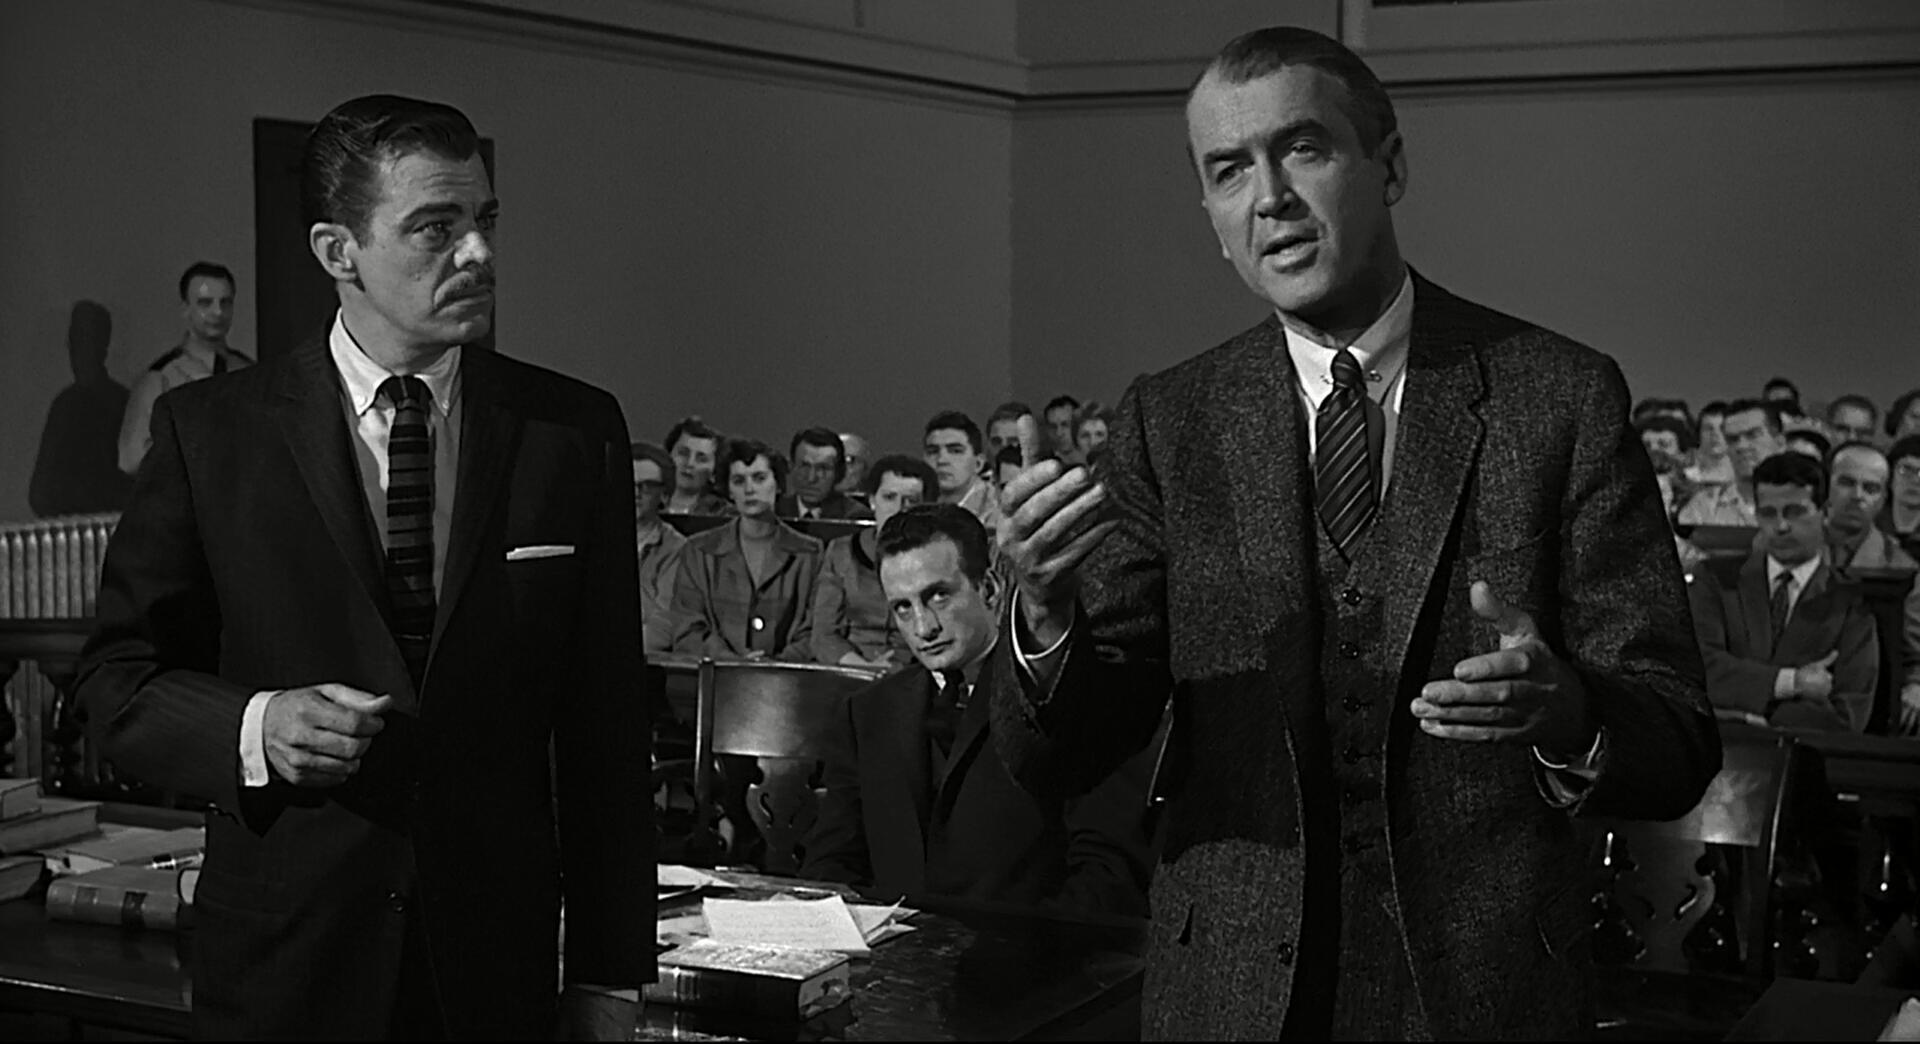 Anatomy-of-a-Murder-1959-02.jpg